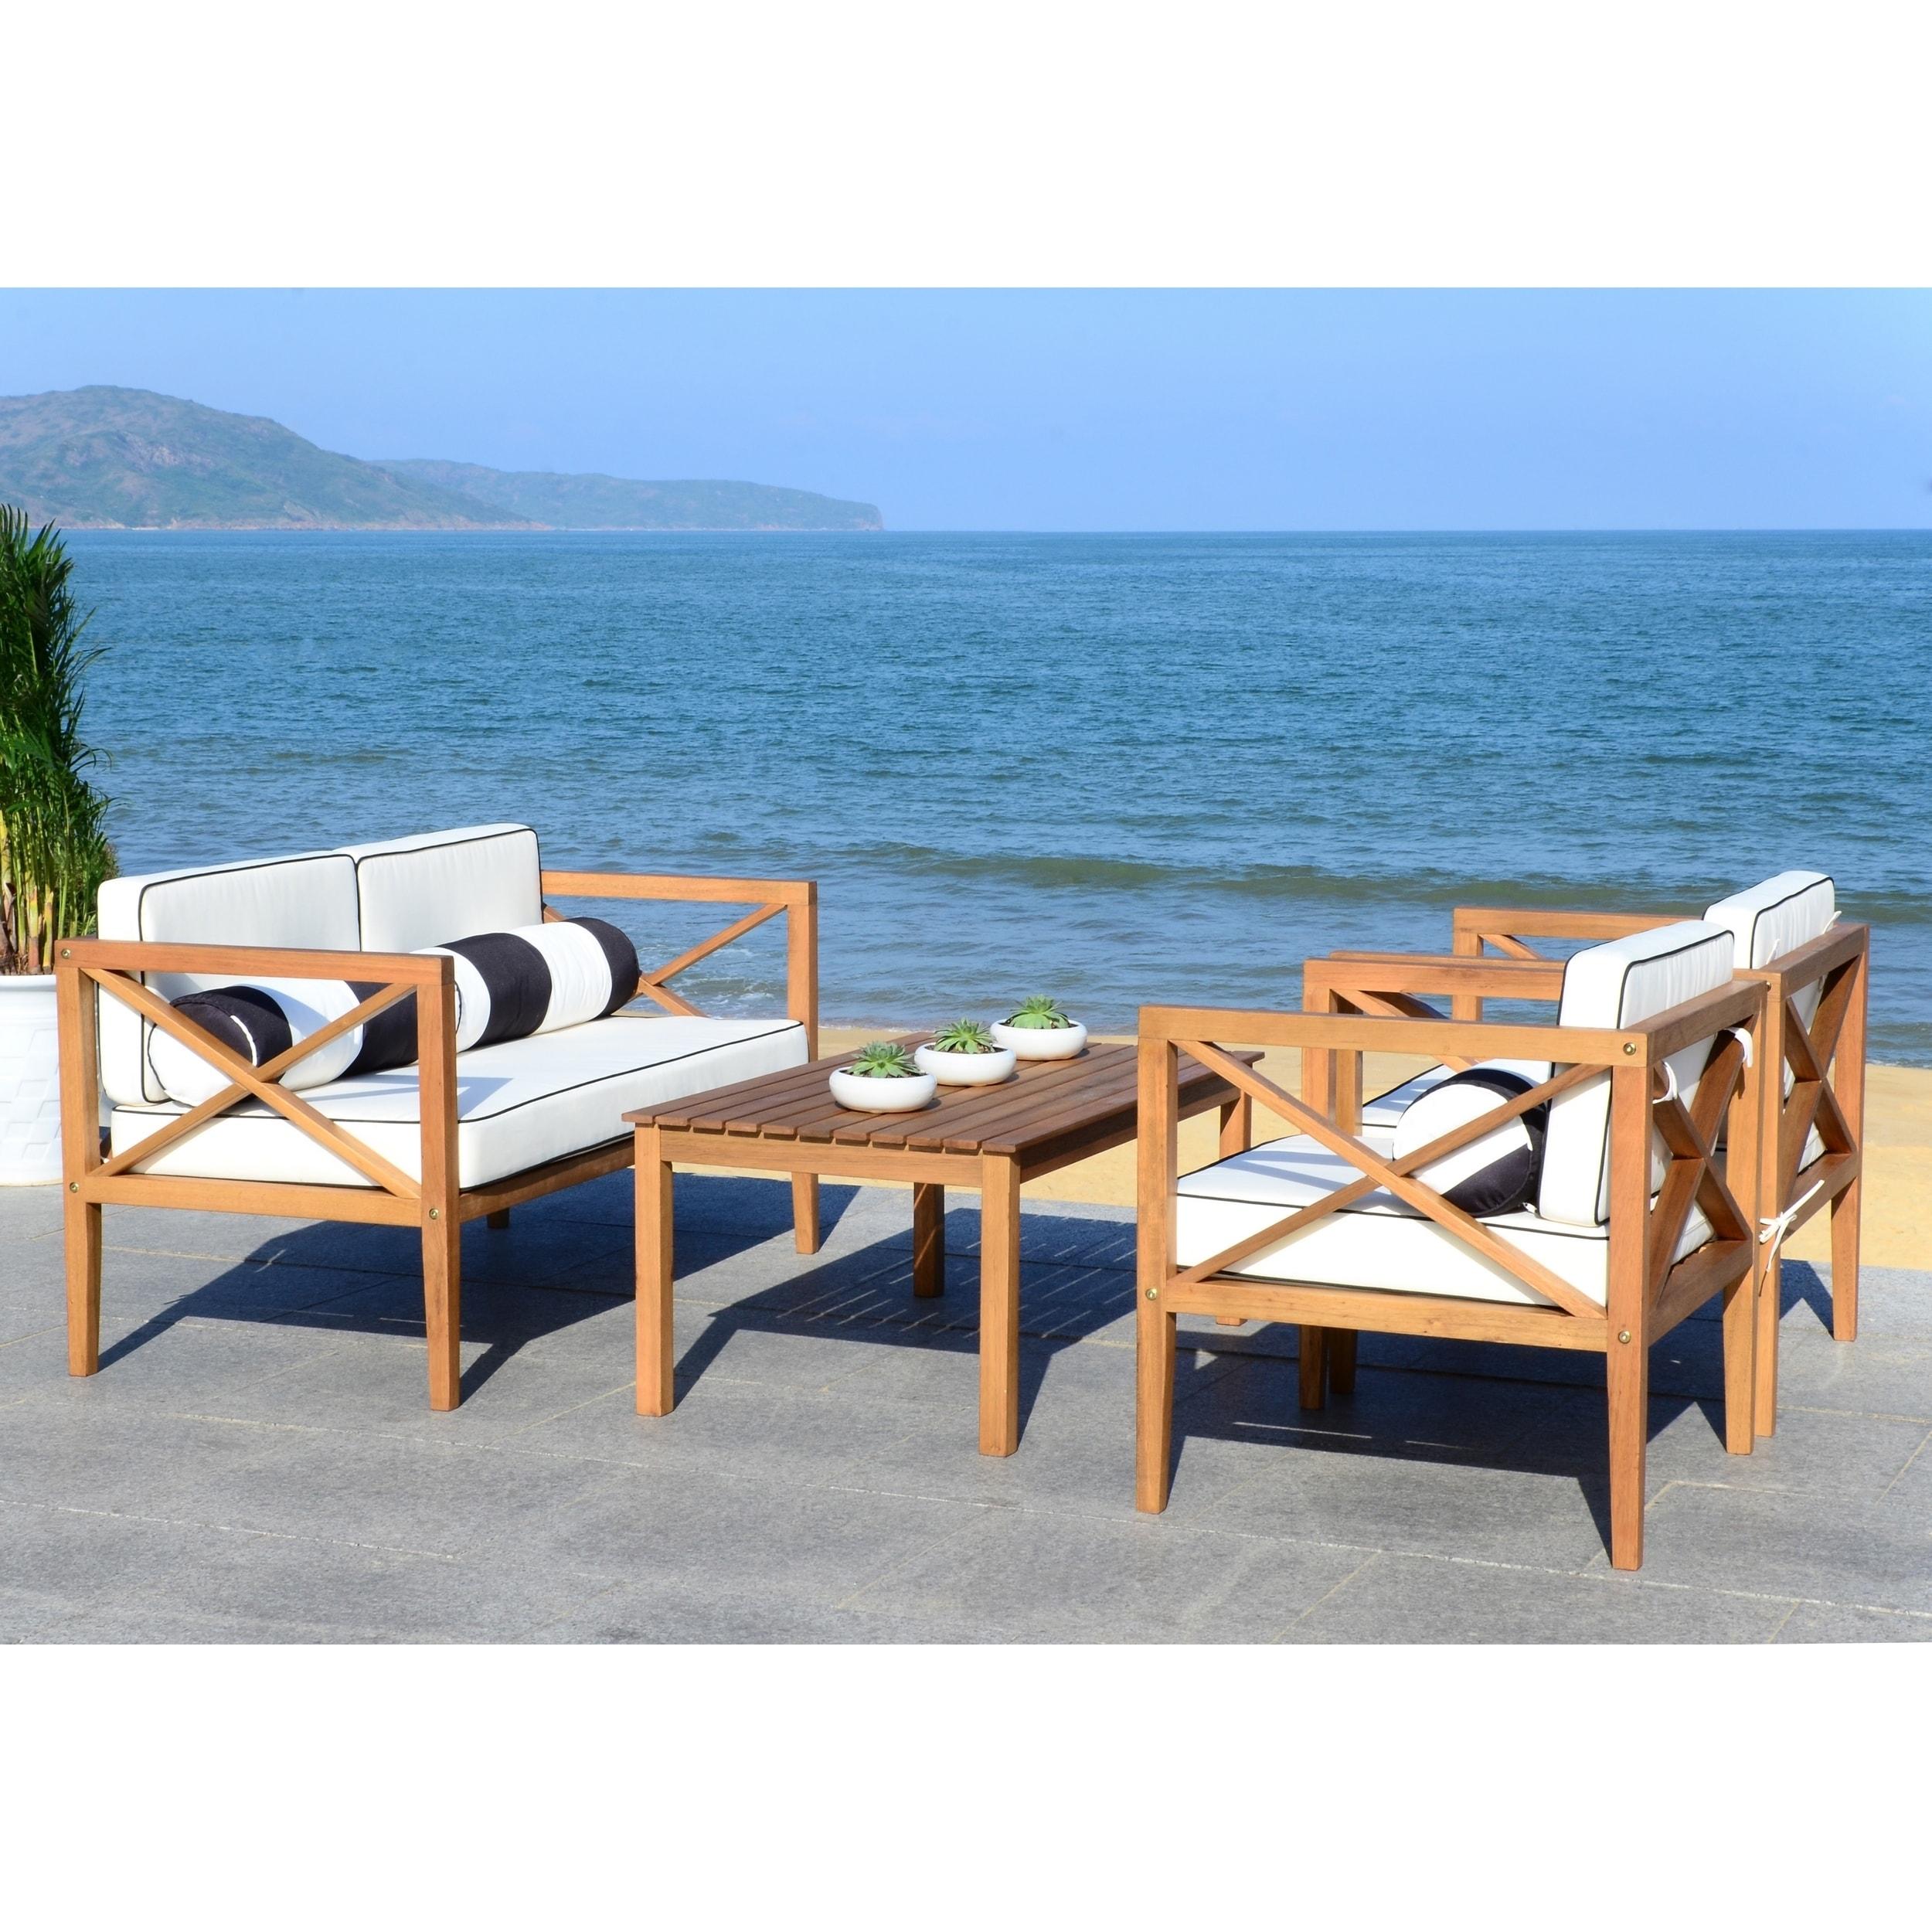 Shop Safavieh Nunzio Natural/Black/White 4 Pc Outdoor Set With ...